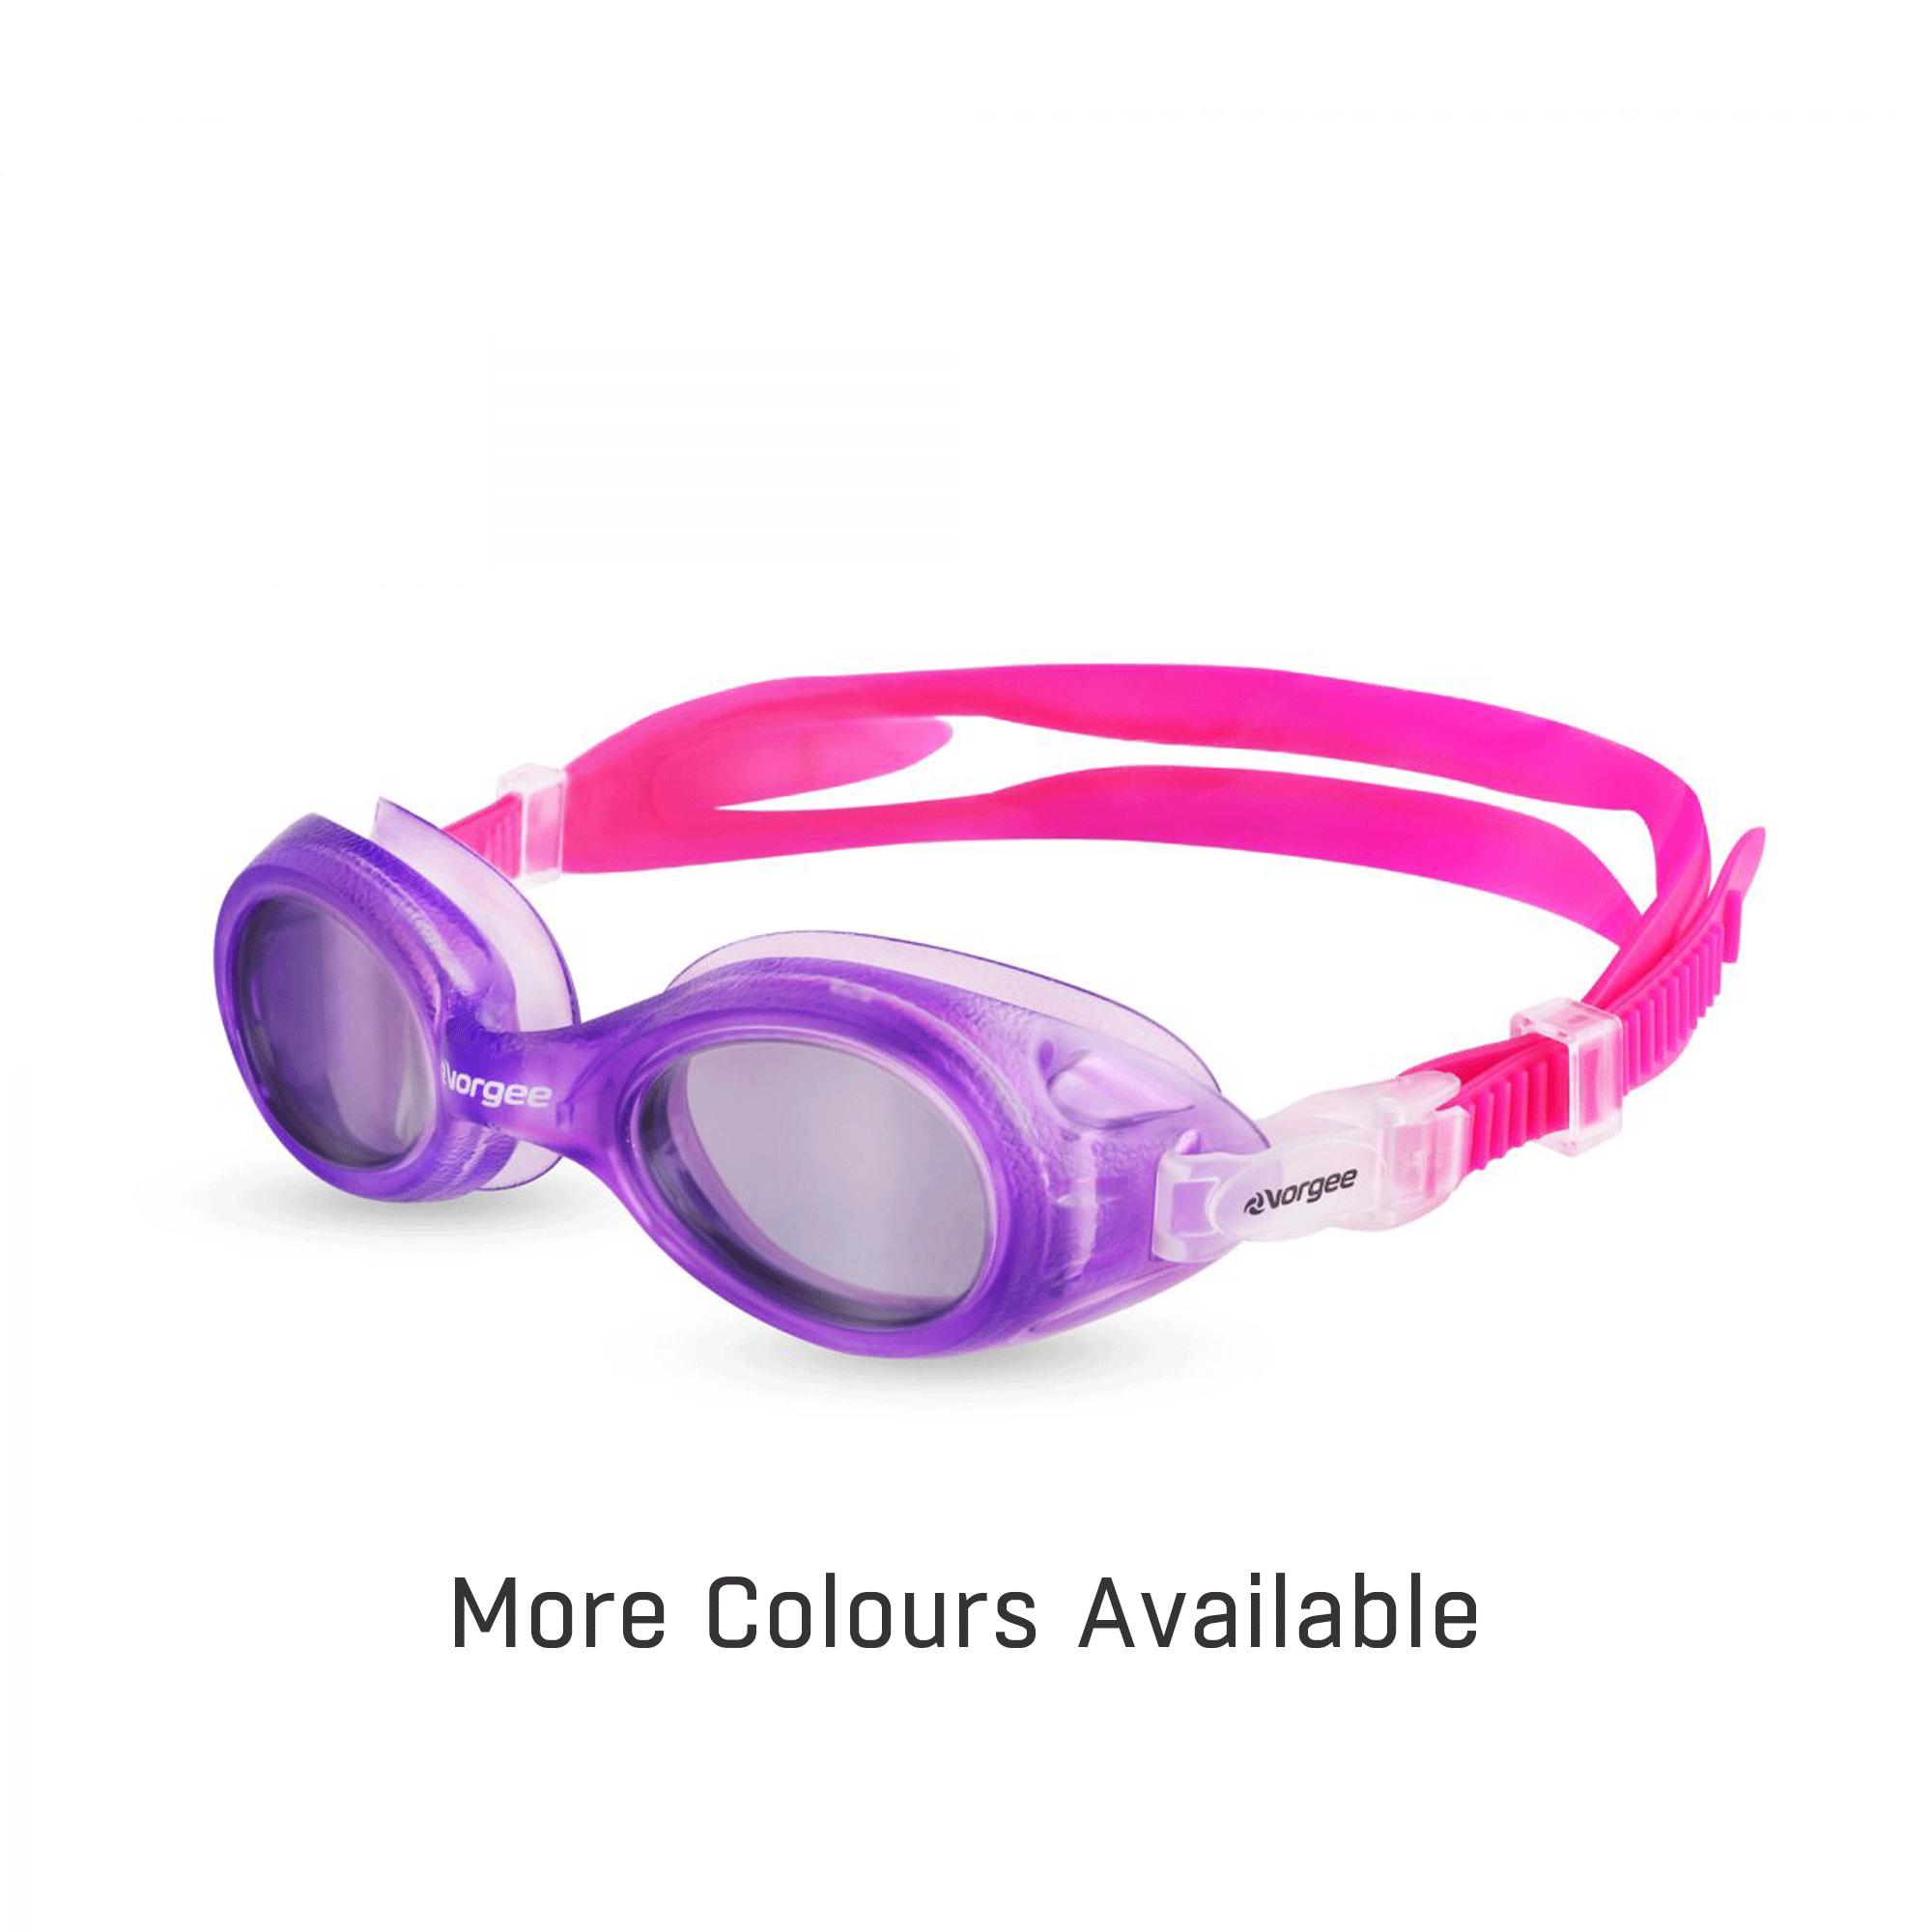 Vorgee Voyager Junior Clear Lens Translucent Purple